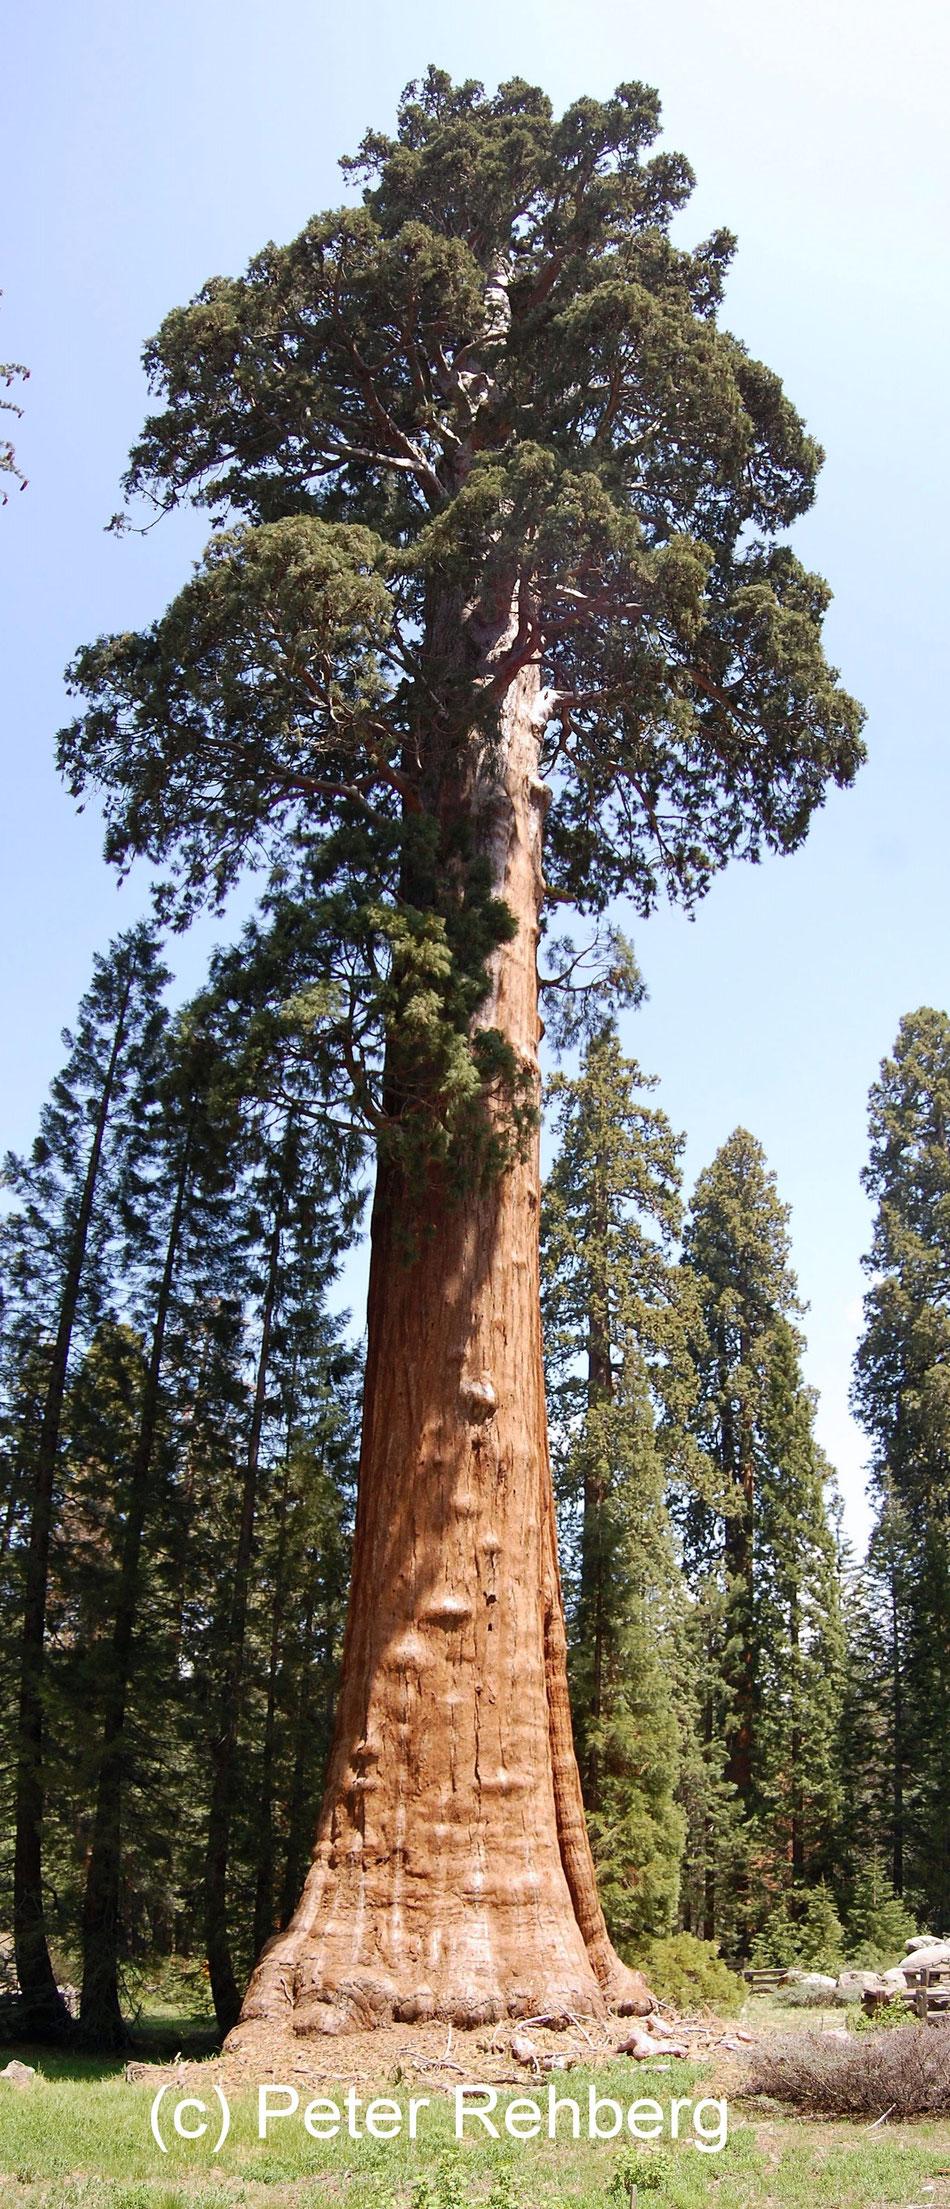 Big Tree Trail, Peter Rehberg